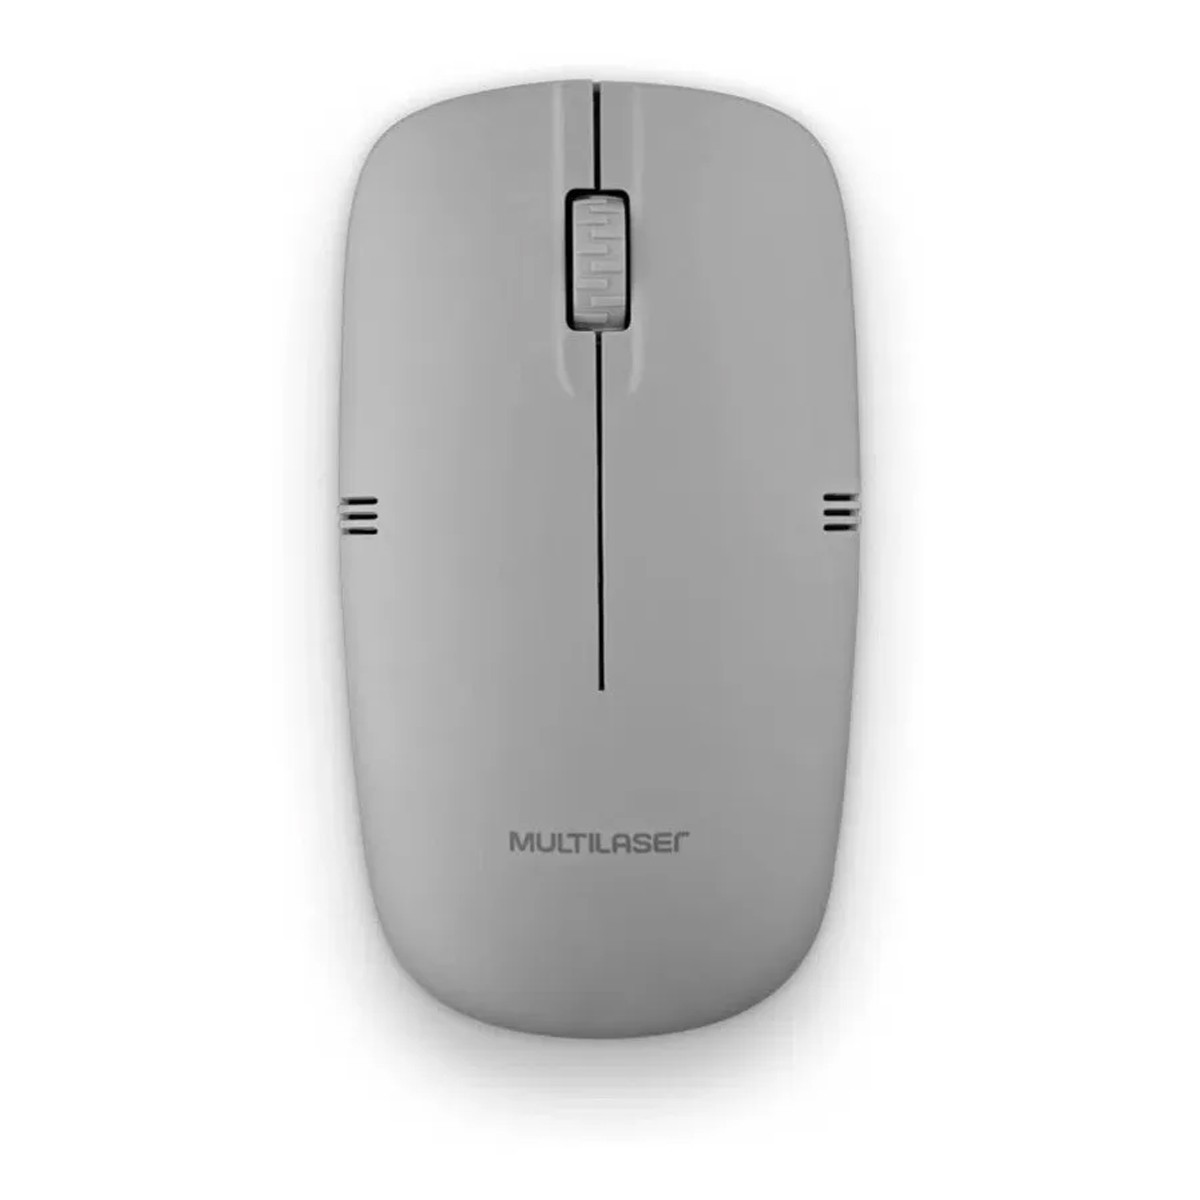 Mouse Óptico Sem Fio Super Leve Multilaser 1200dpi - MO287